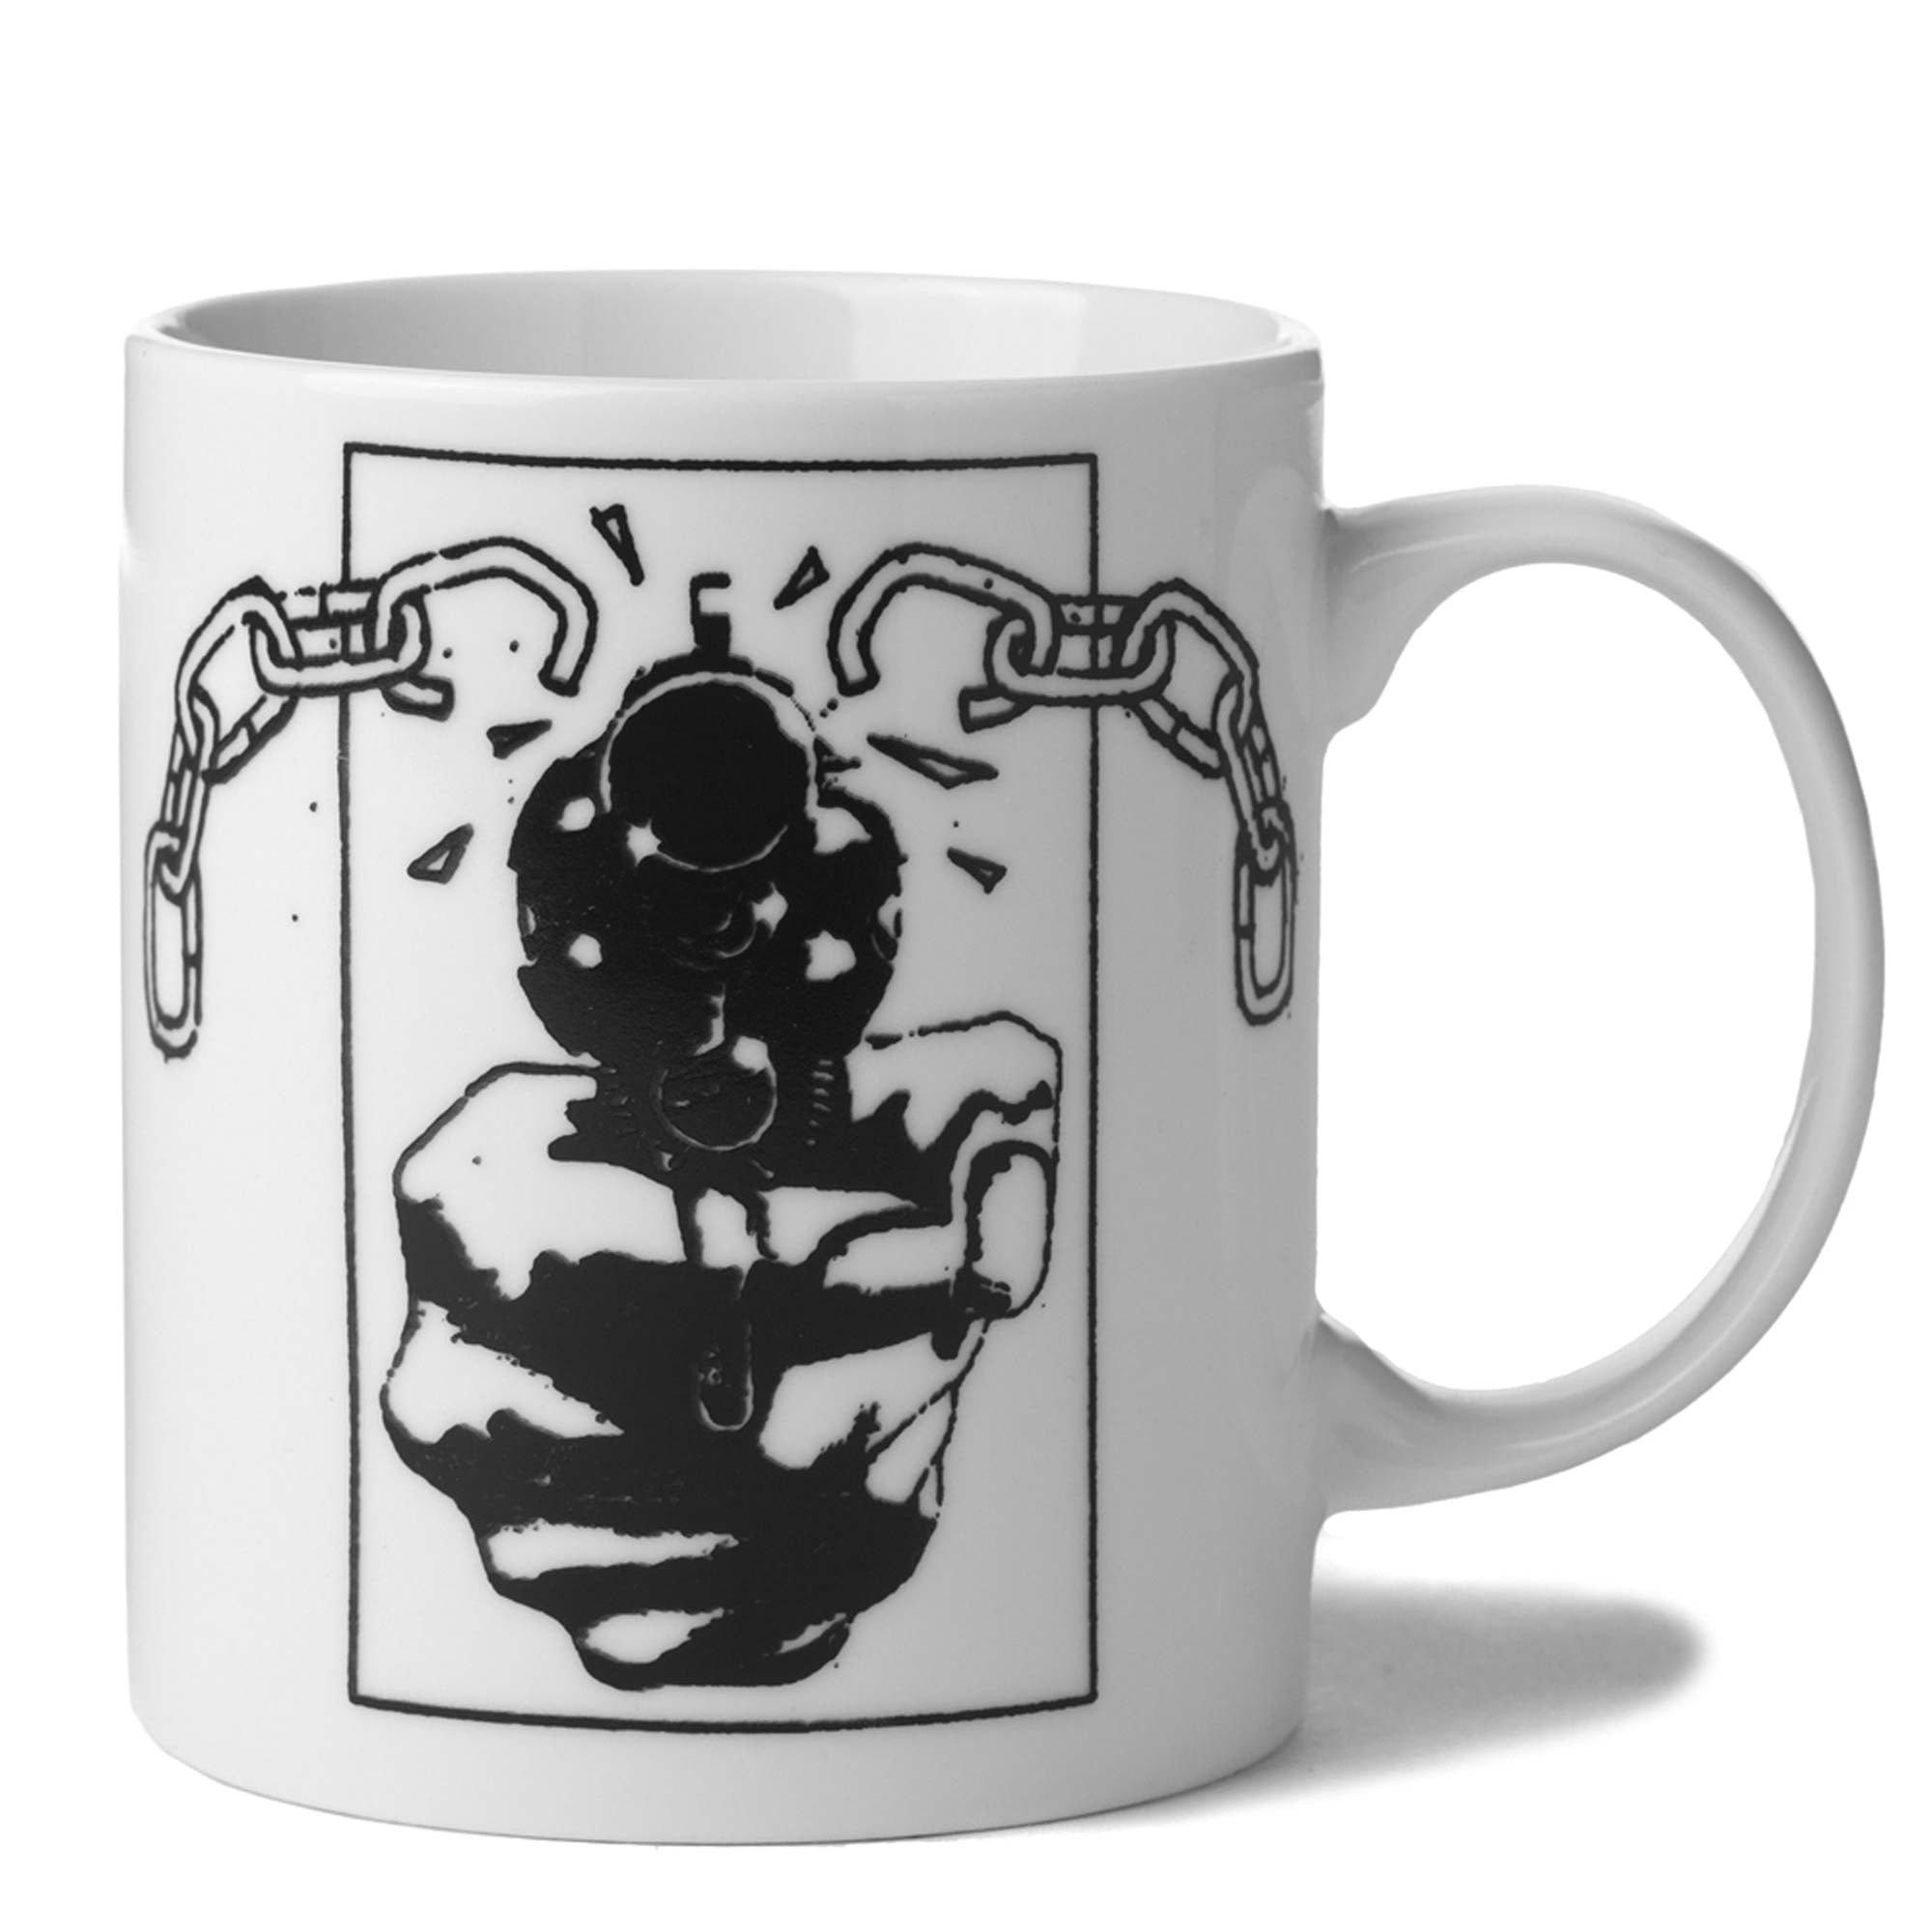 Huf Men's Huf Coffee Mug, White, One Size